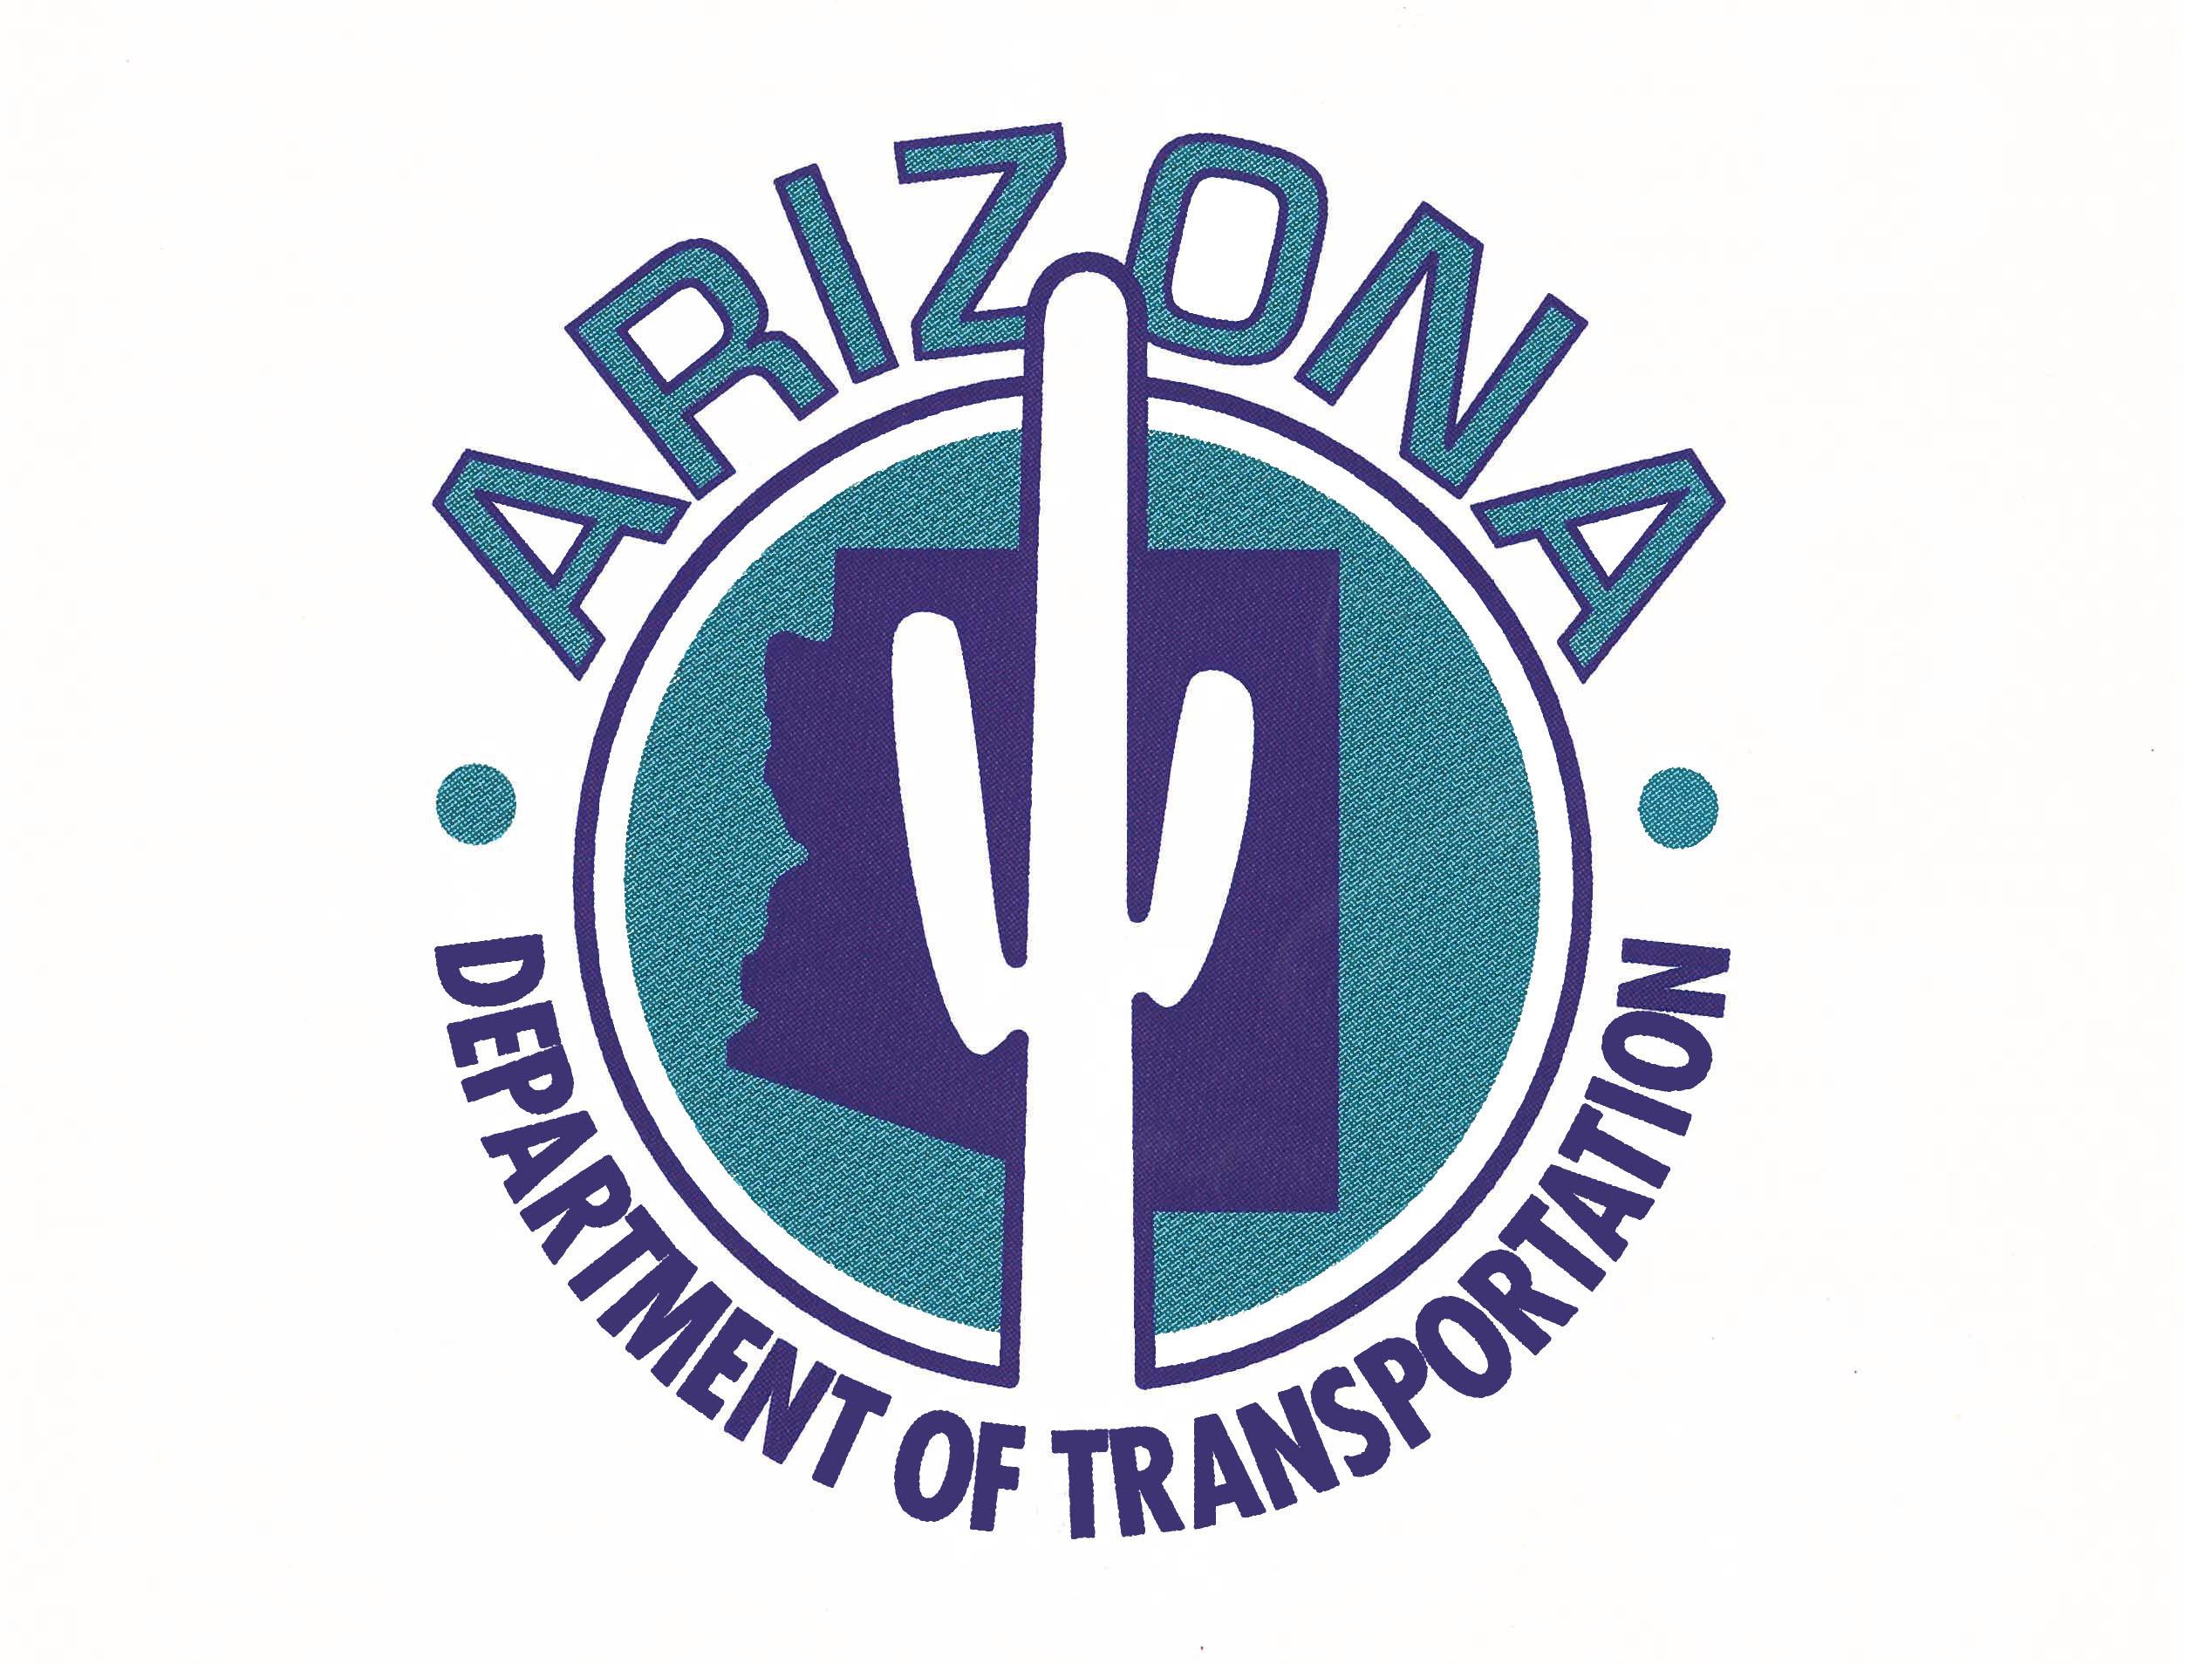 New logo 1995-1999